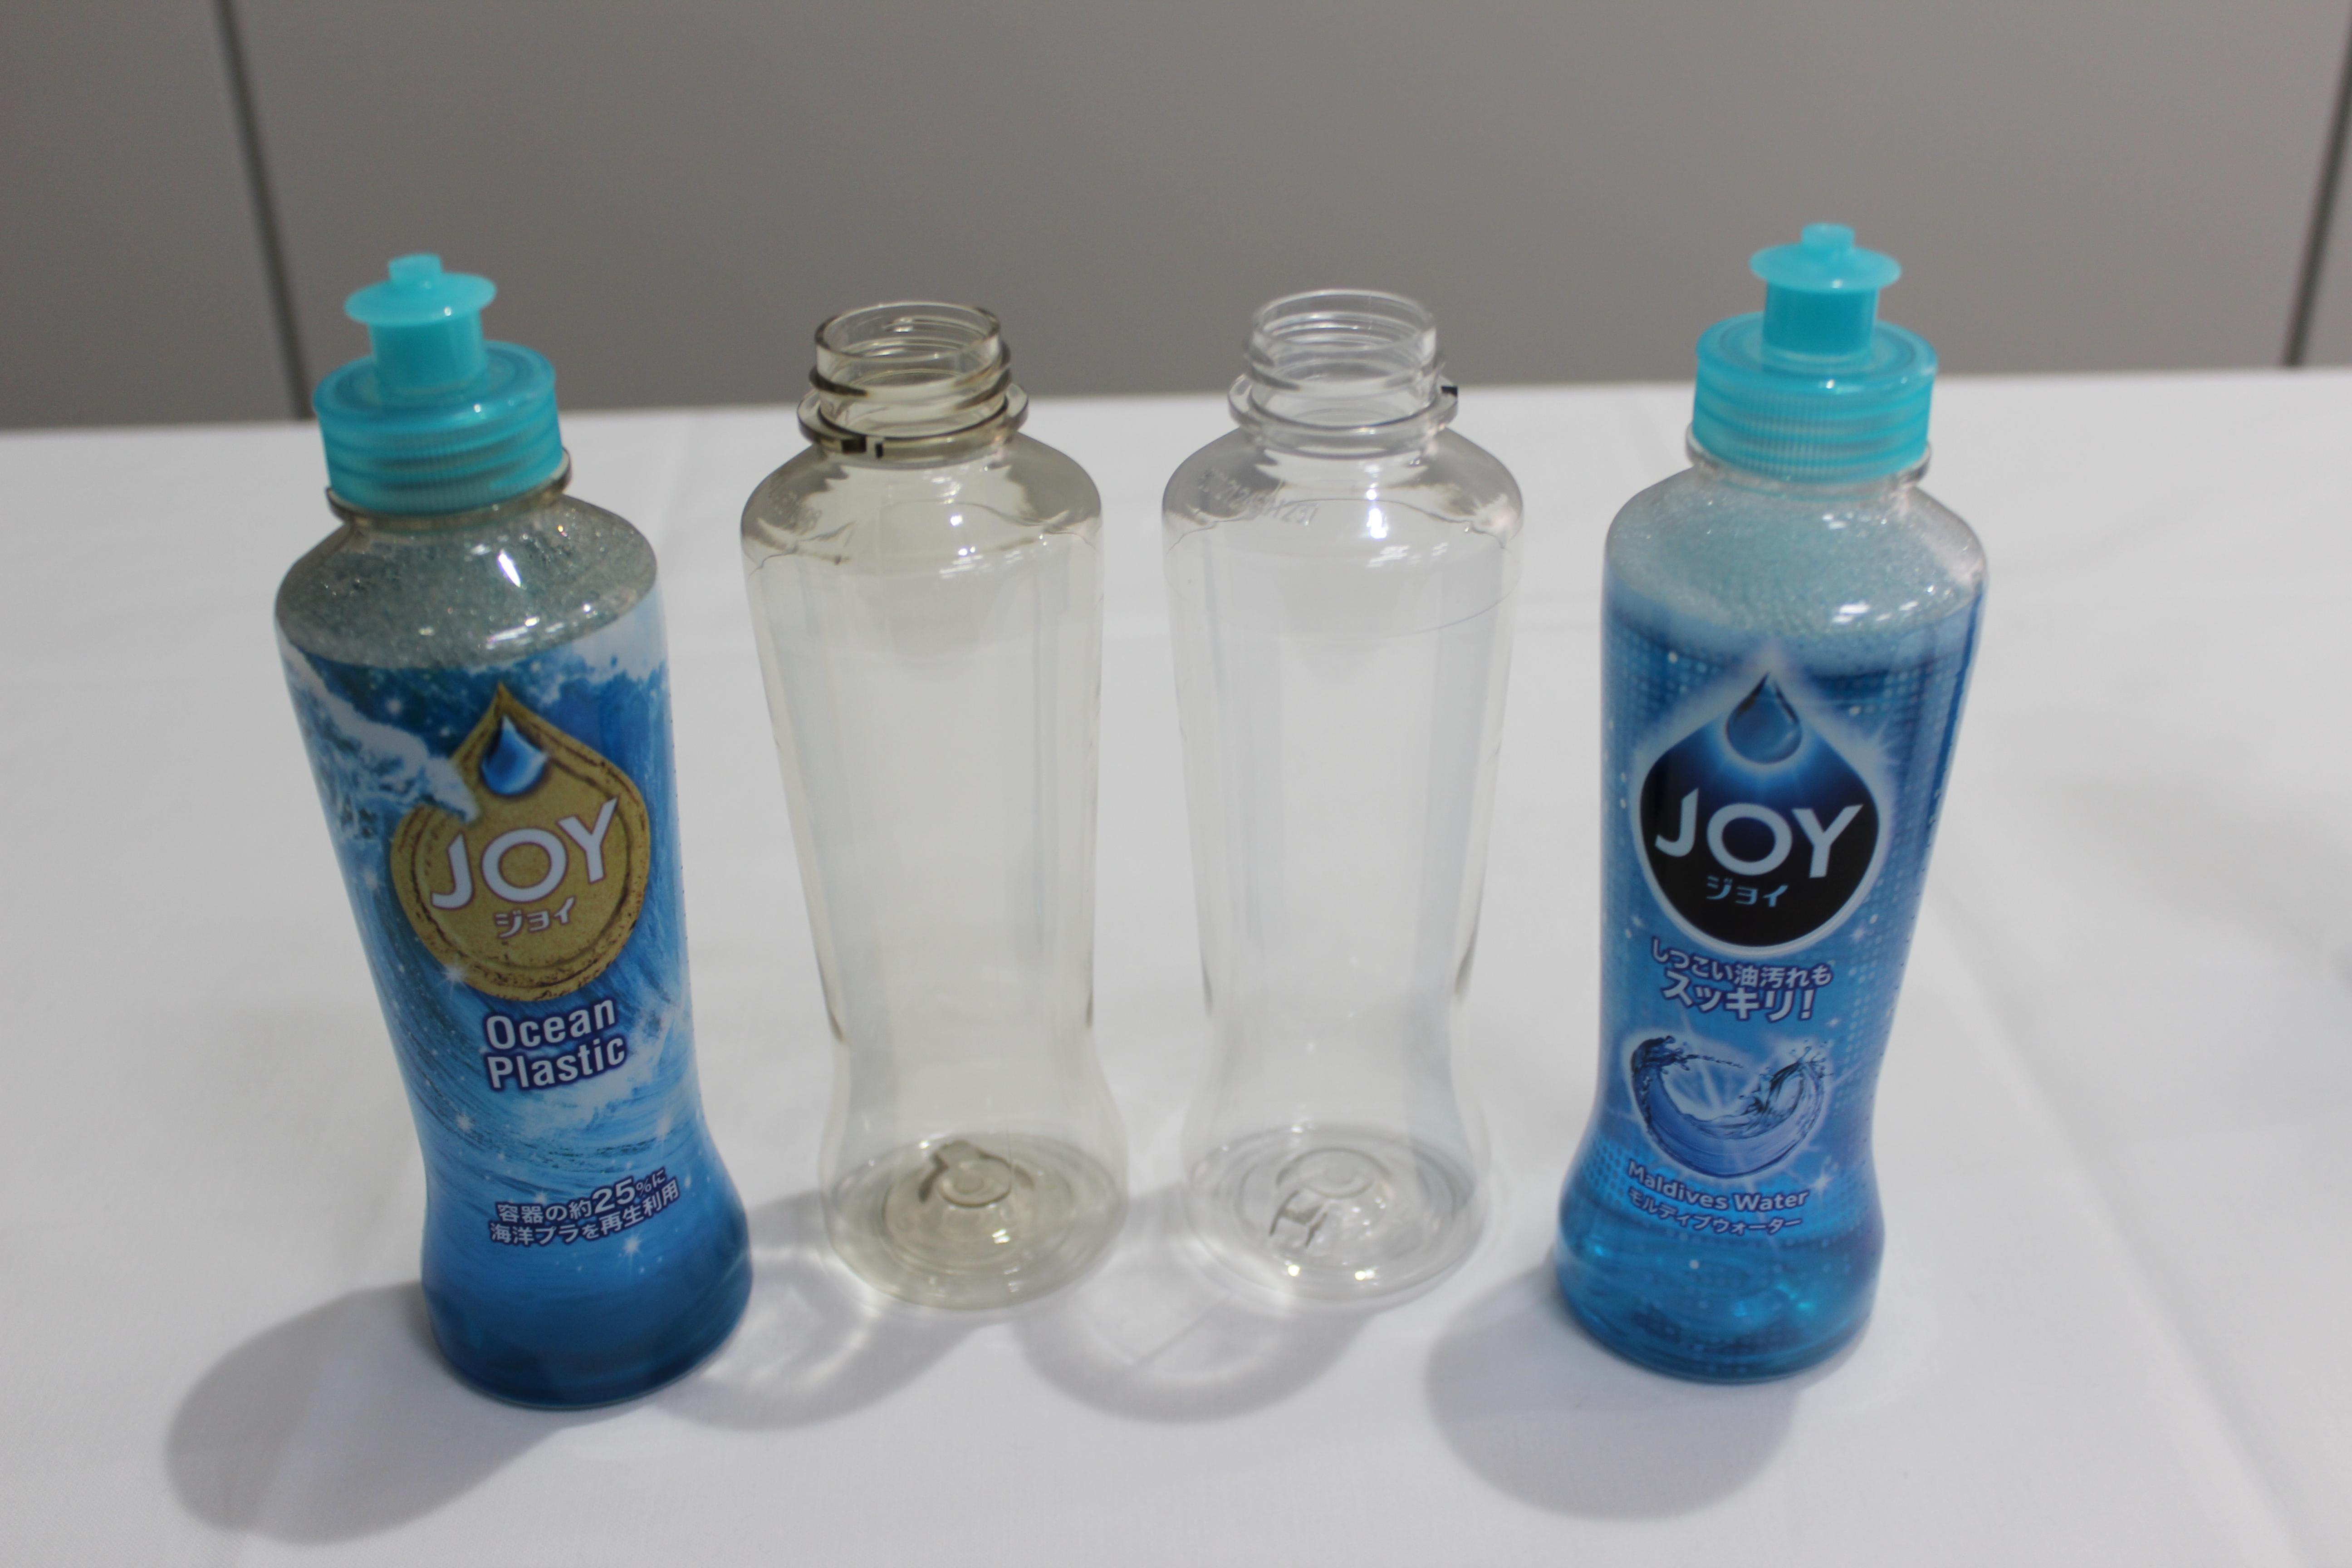 joy-ocean-plastic2